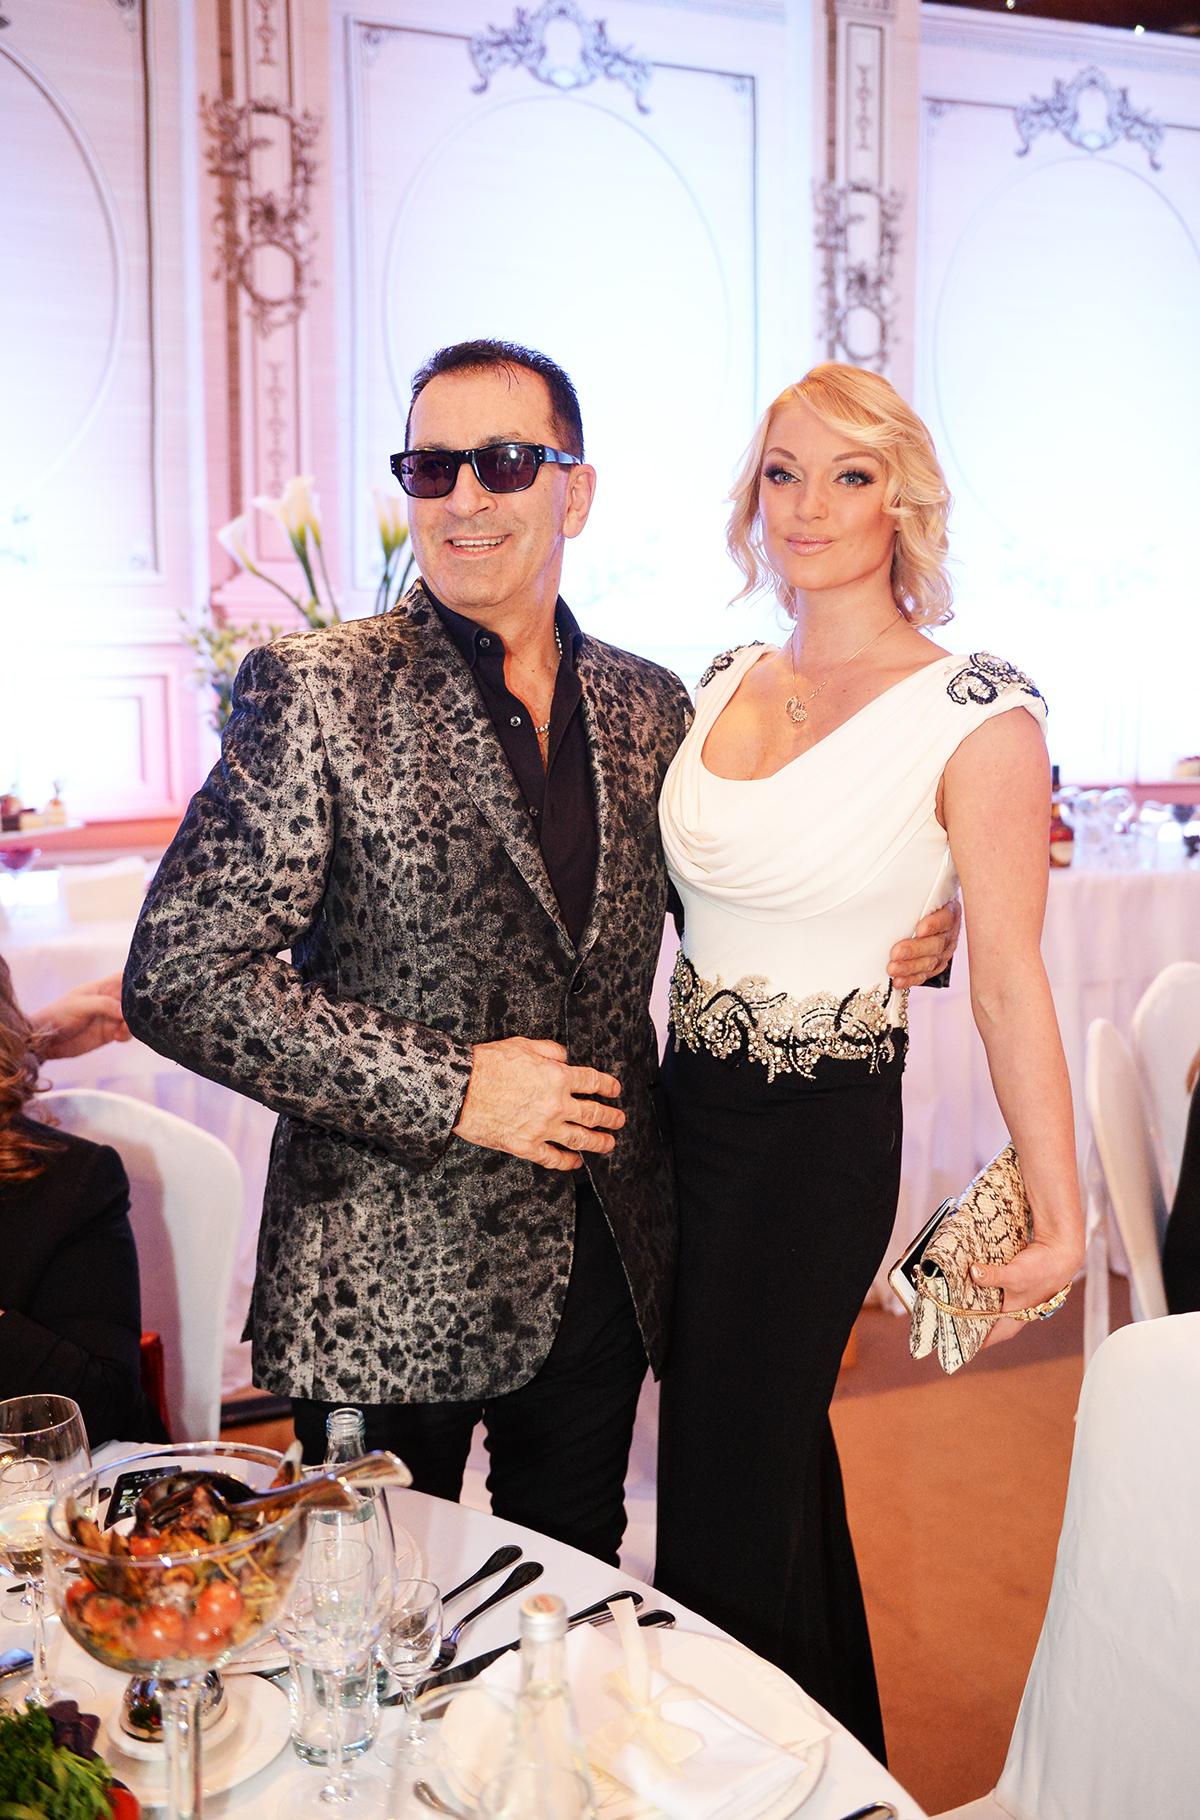 Александр Буйнов и Анастасия Волочкова